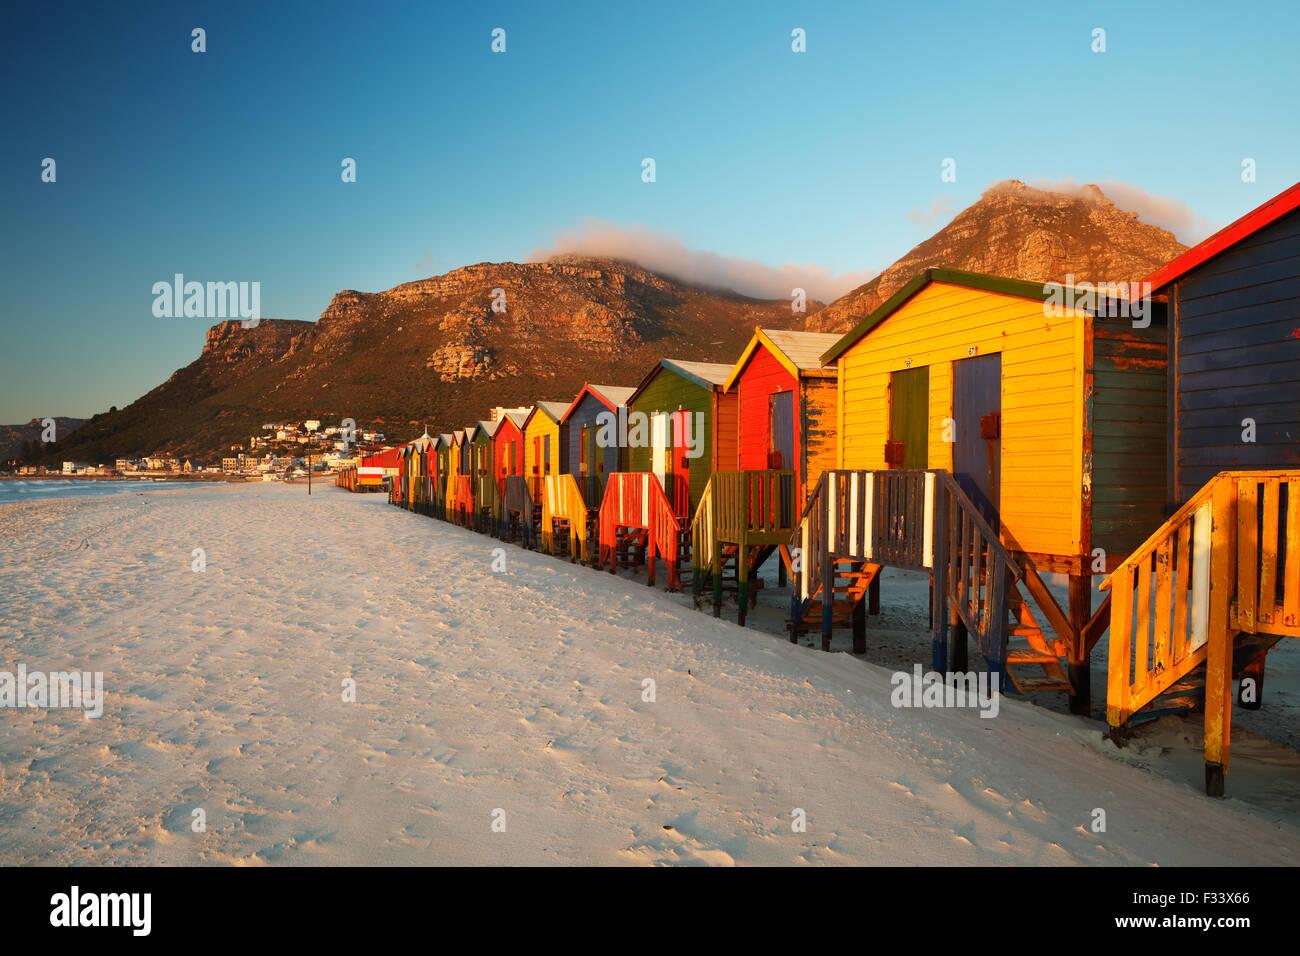 Umkleidekabinen am Strand von Muizenberg, Kapstadt, Südafrika Stockbild